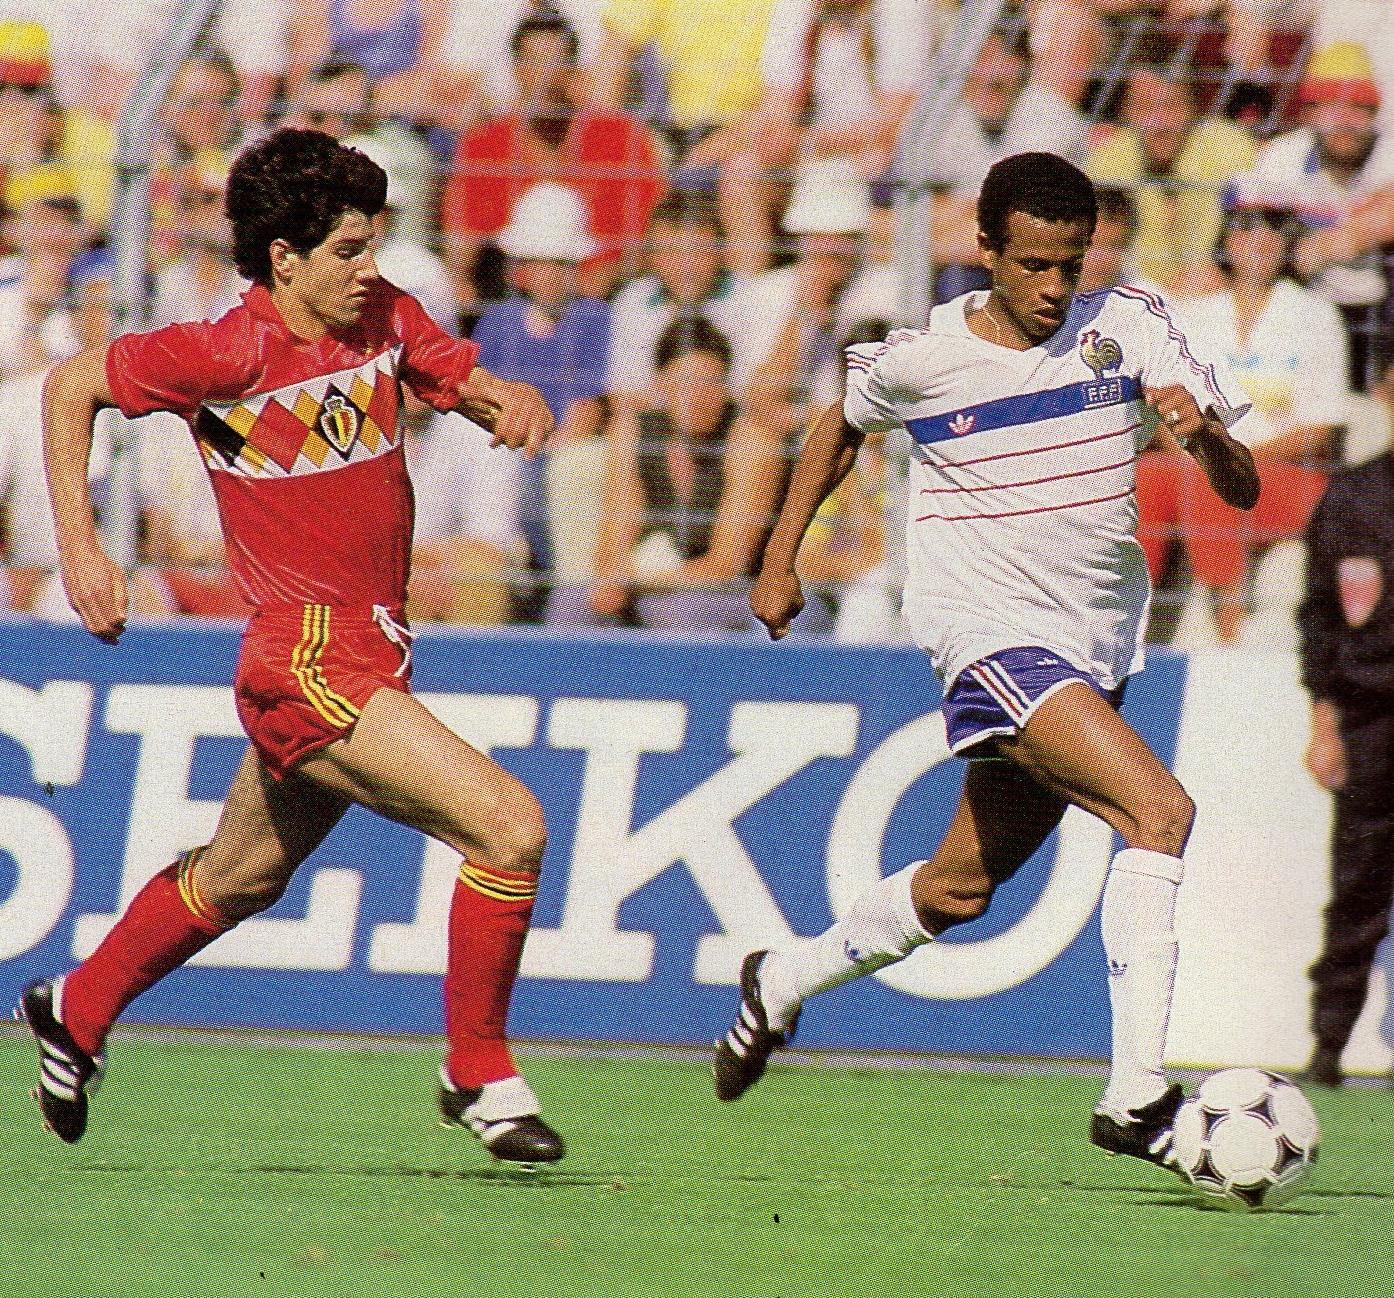 idokapszula_1984_franciaorszagi_labdarugo_europa-bajnoksag_csoportkorok_franciaorszag_belgium_scifo_tigana.jpg